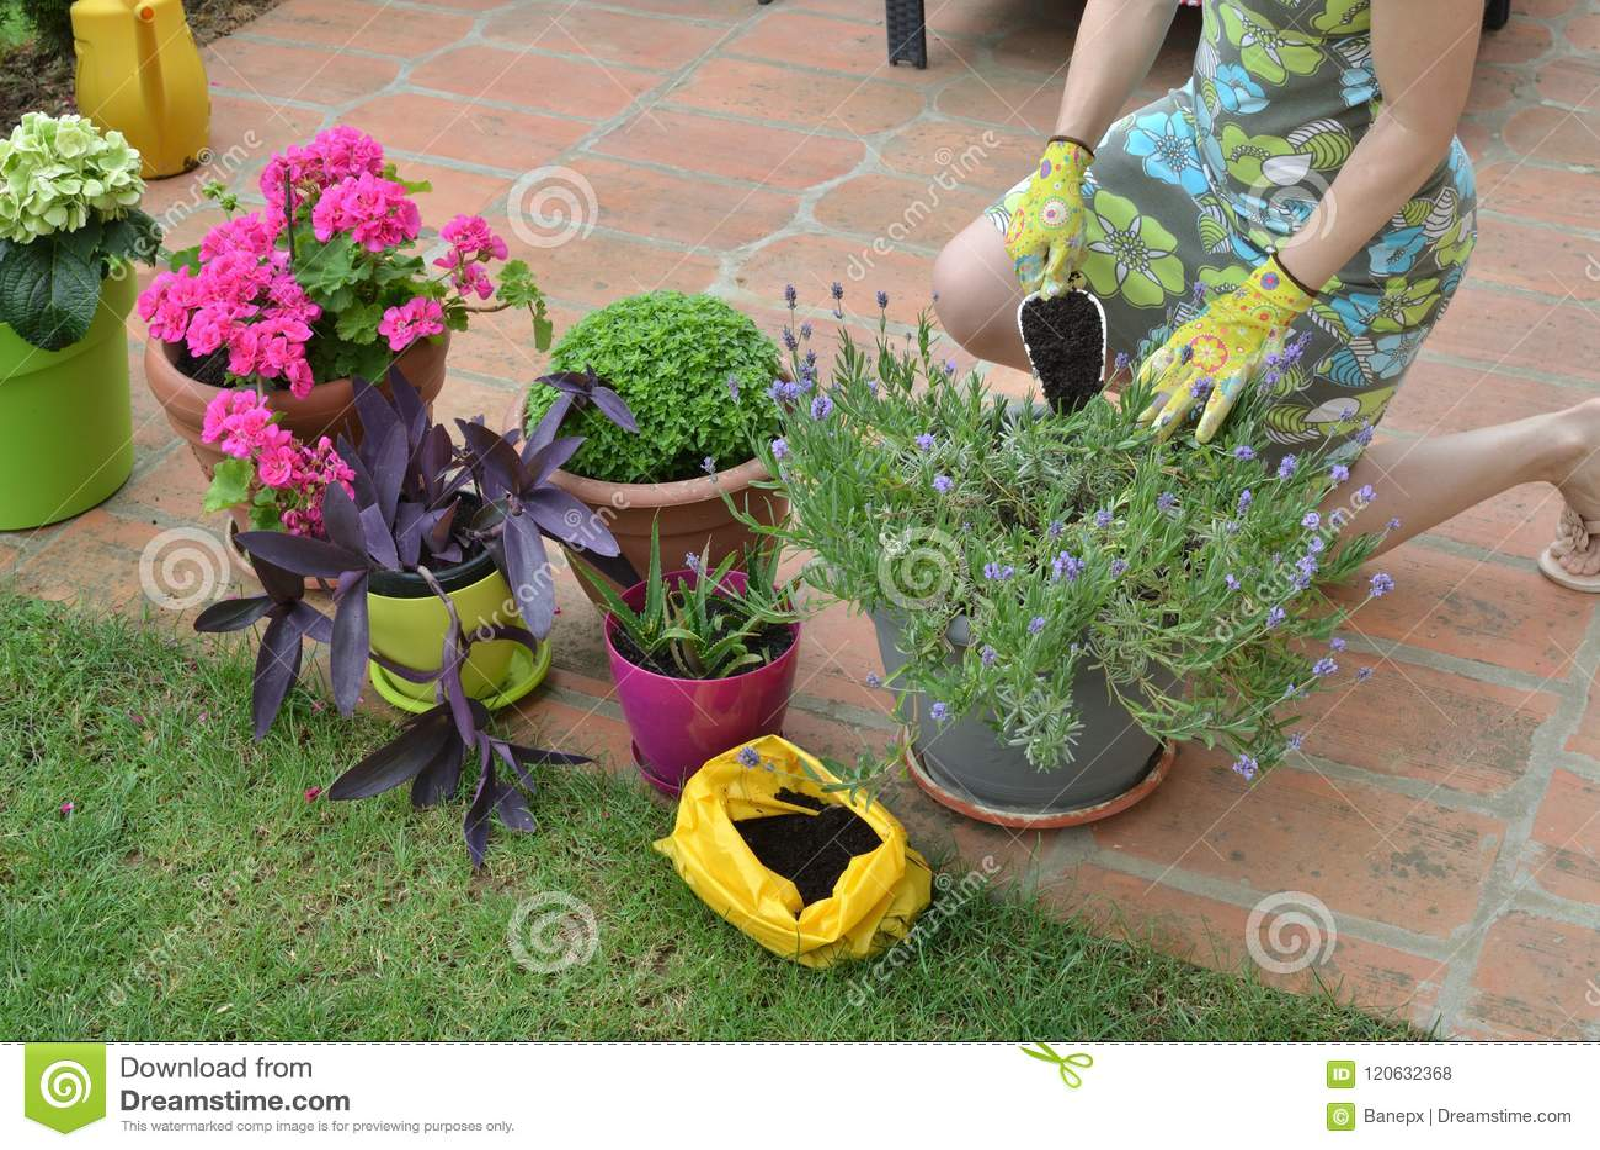 Woman working in a garden